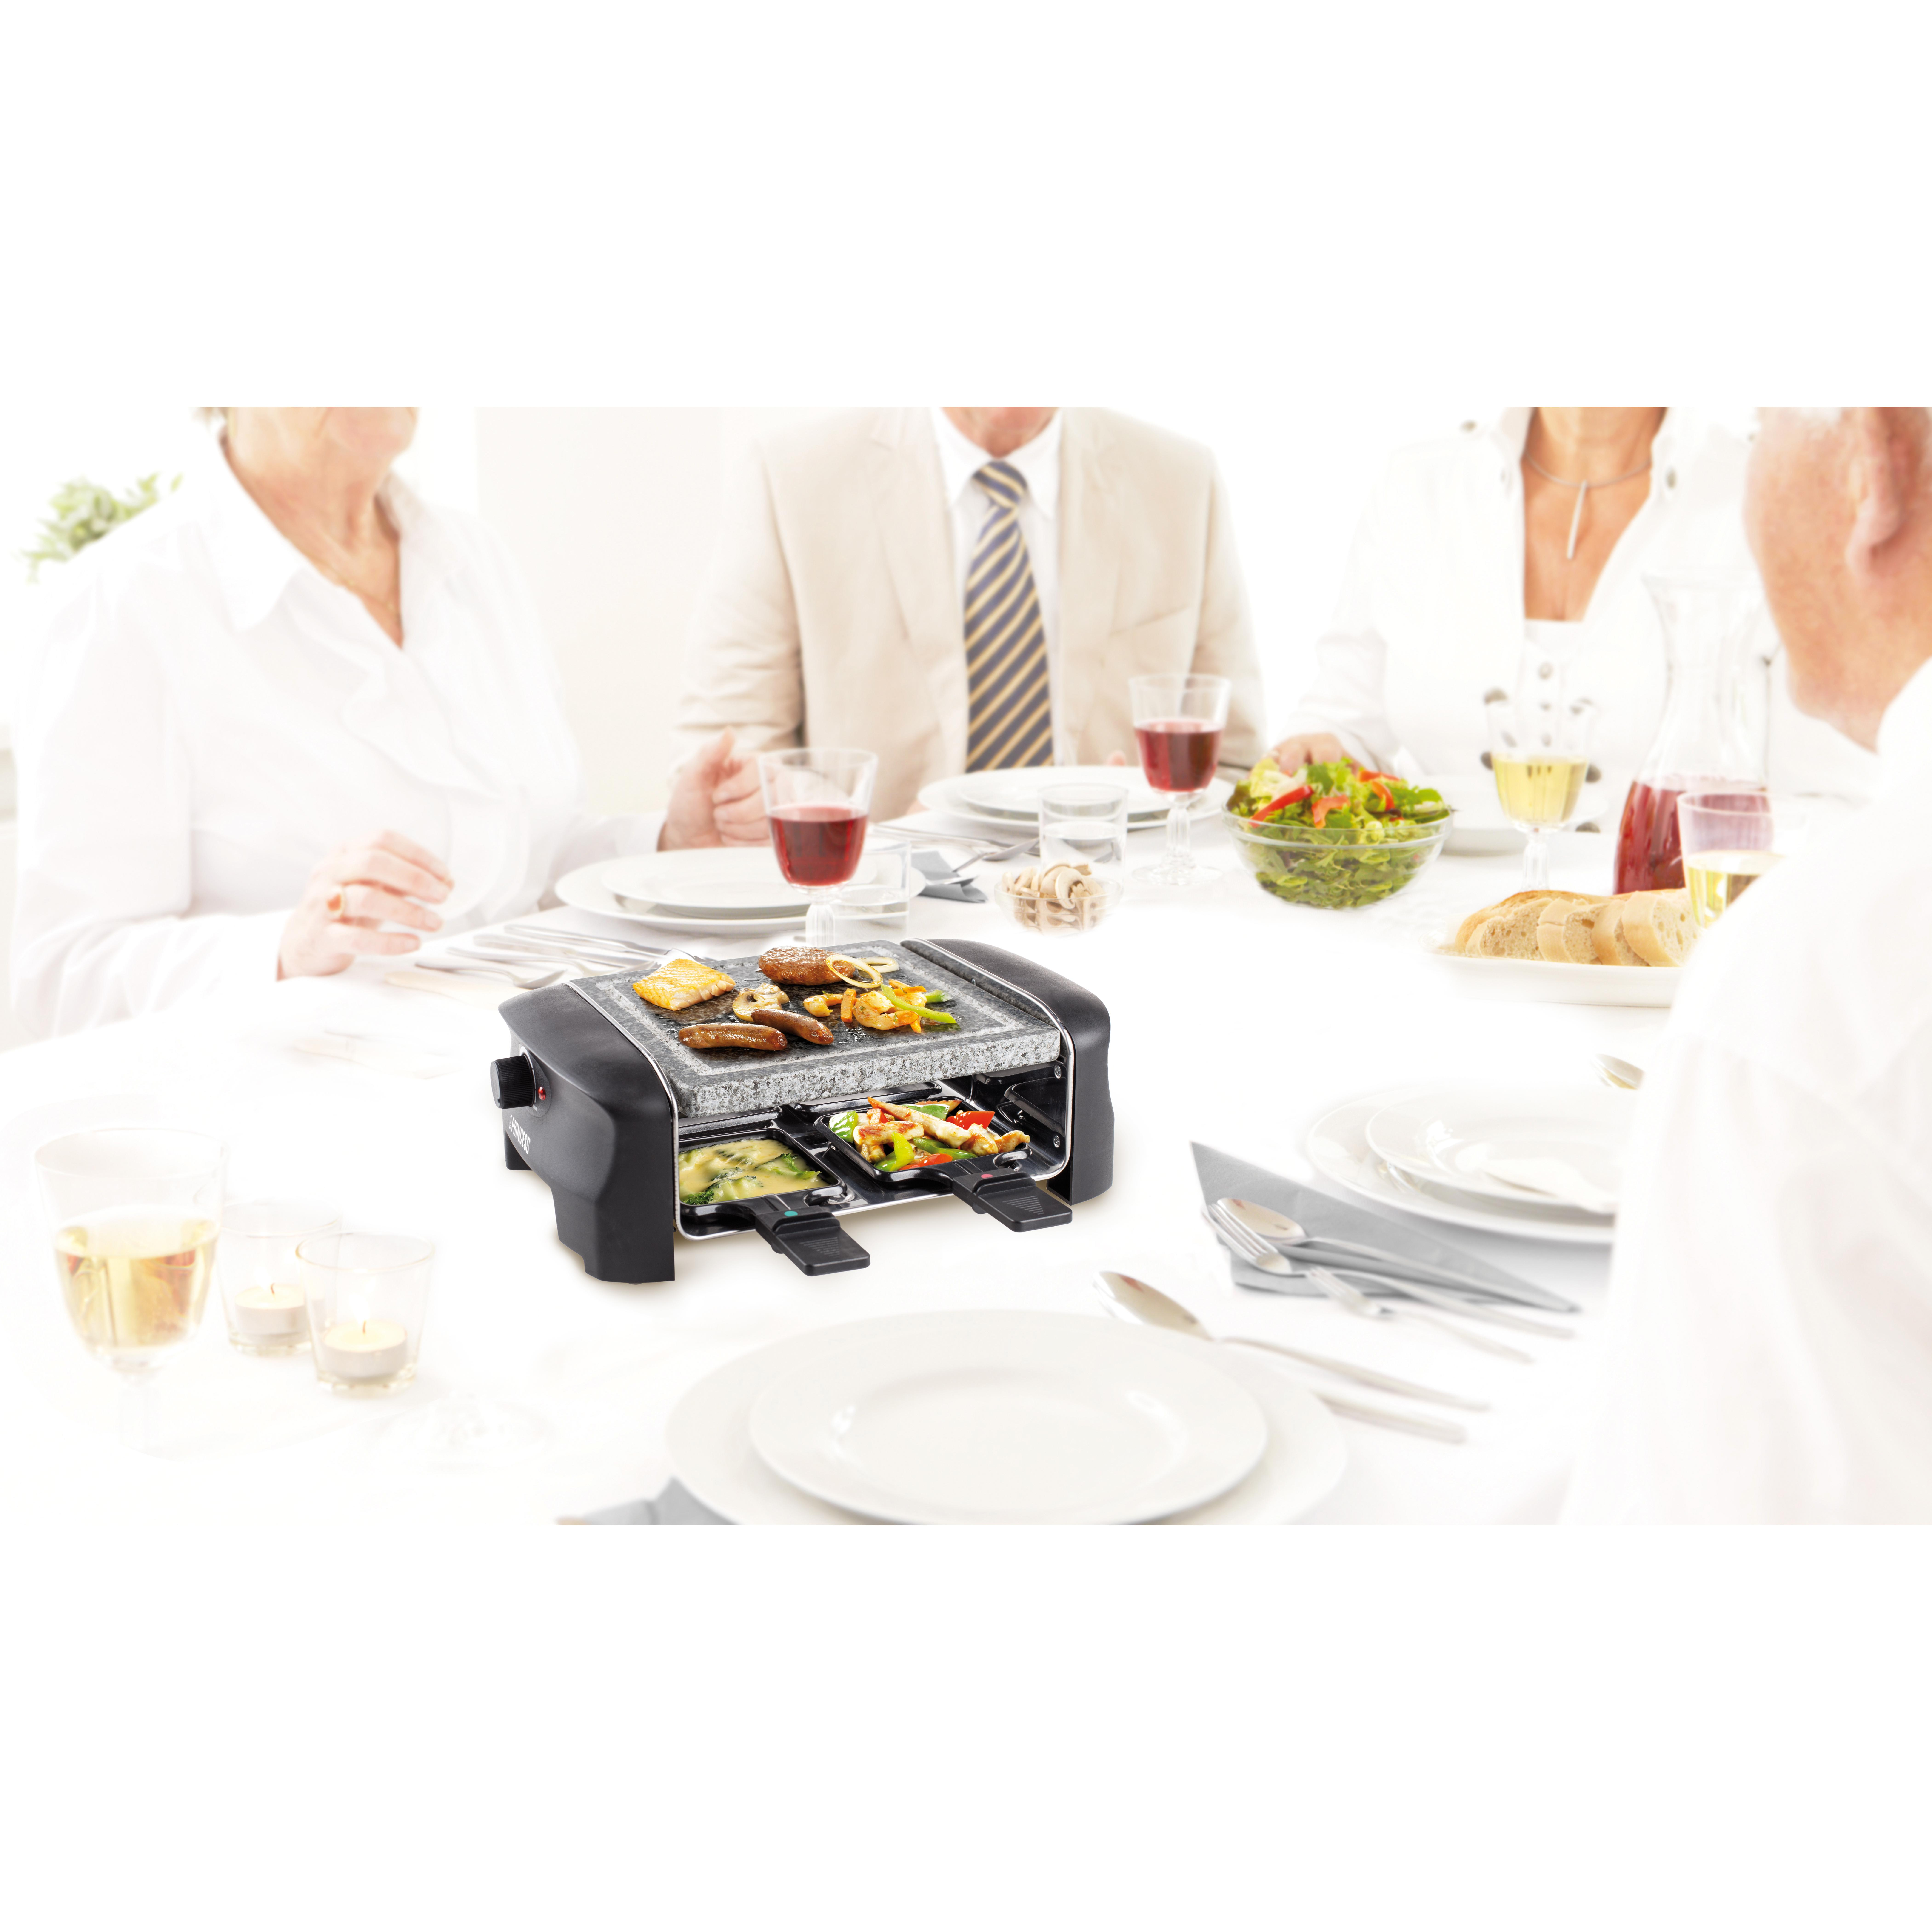 Princess-01-162810-01-001-162810-Raclette-4-Stone-Grill-Party-600-W-210x210 thumbnail 2